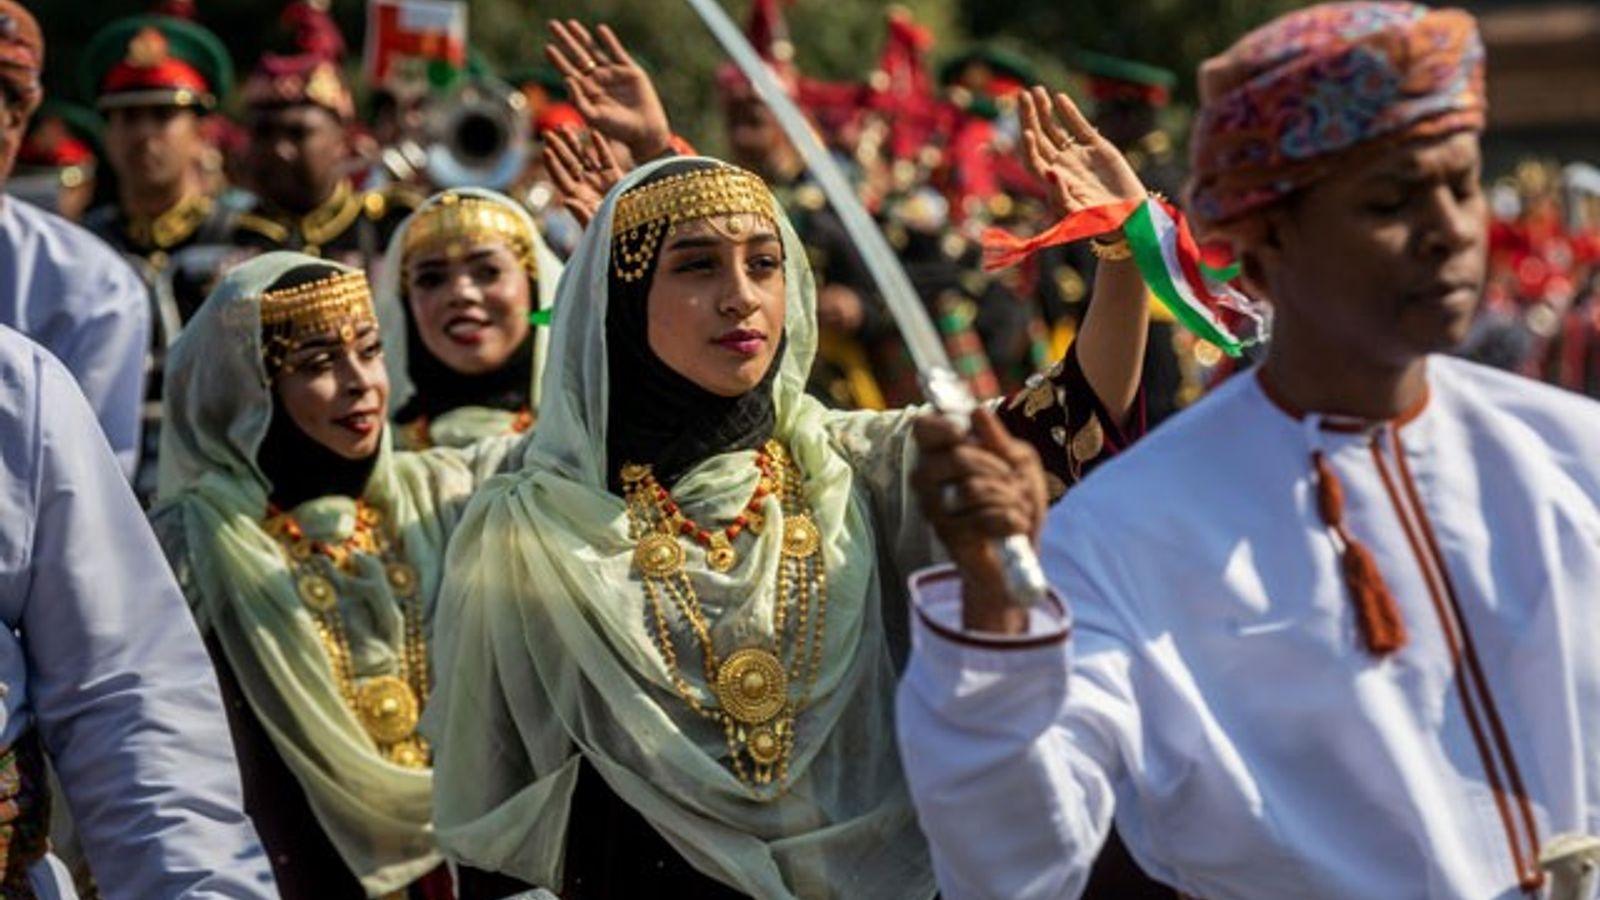 A traditional Omani wedding